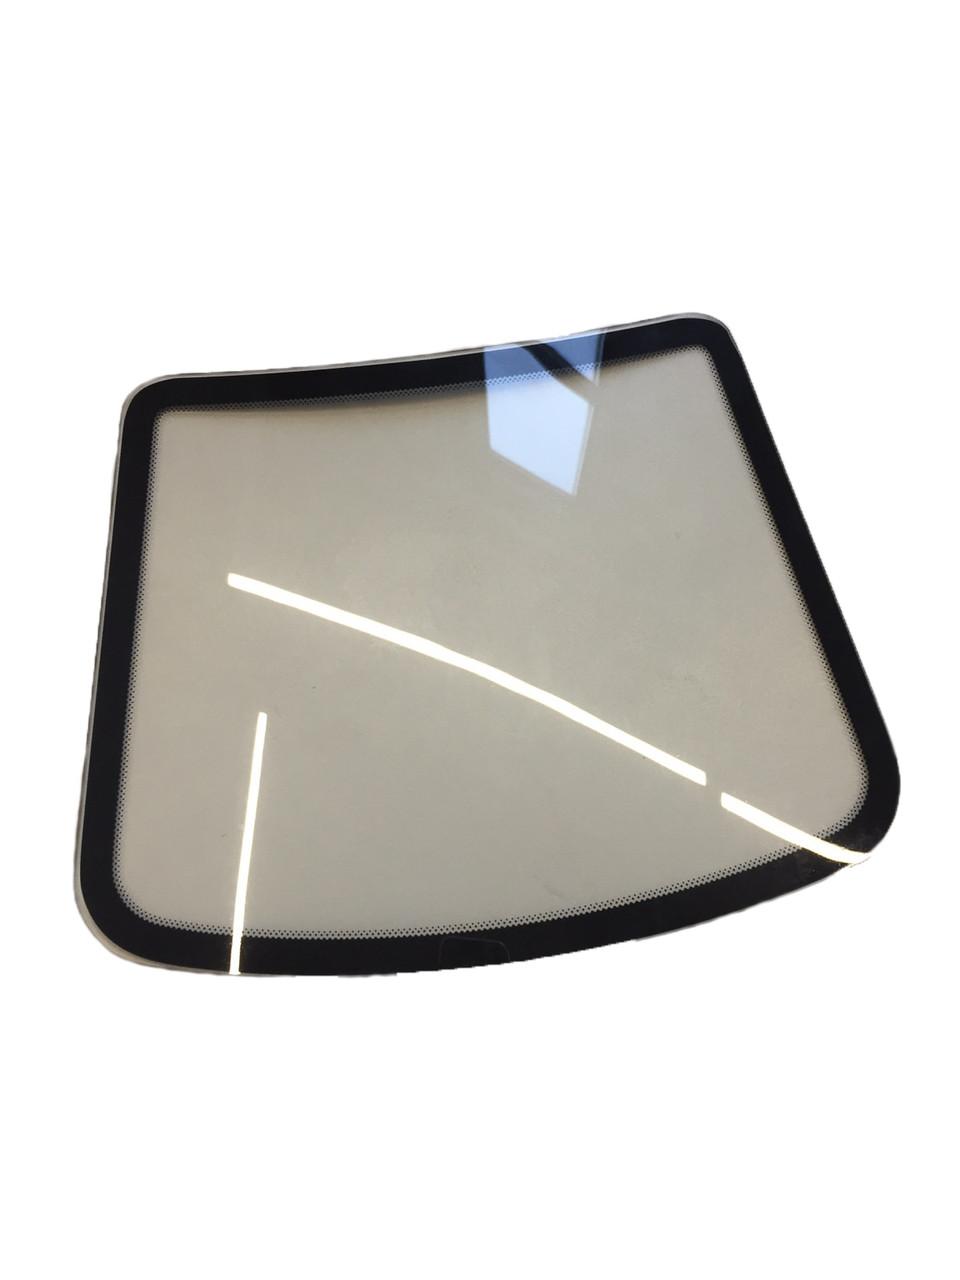 TM-283 Модель ветрового стекла - curved windshield glass, 31 x 24 cm